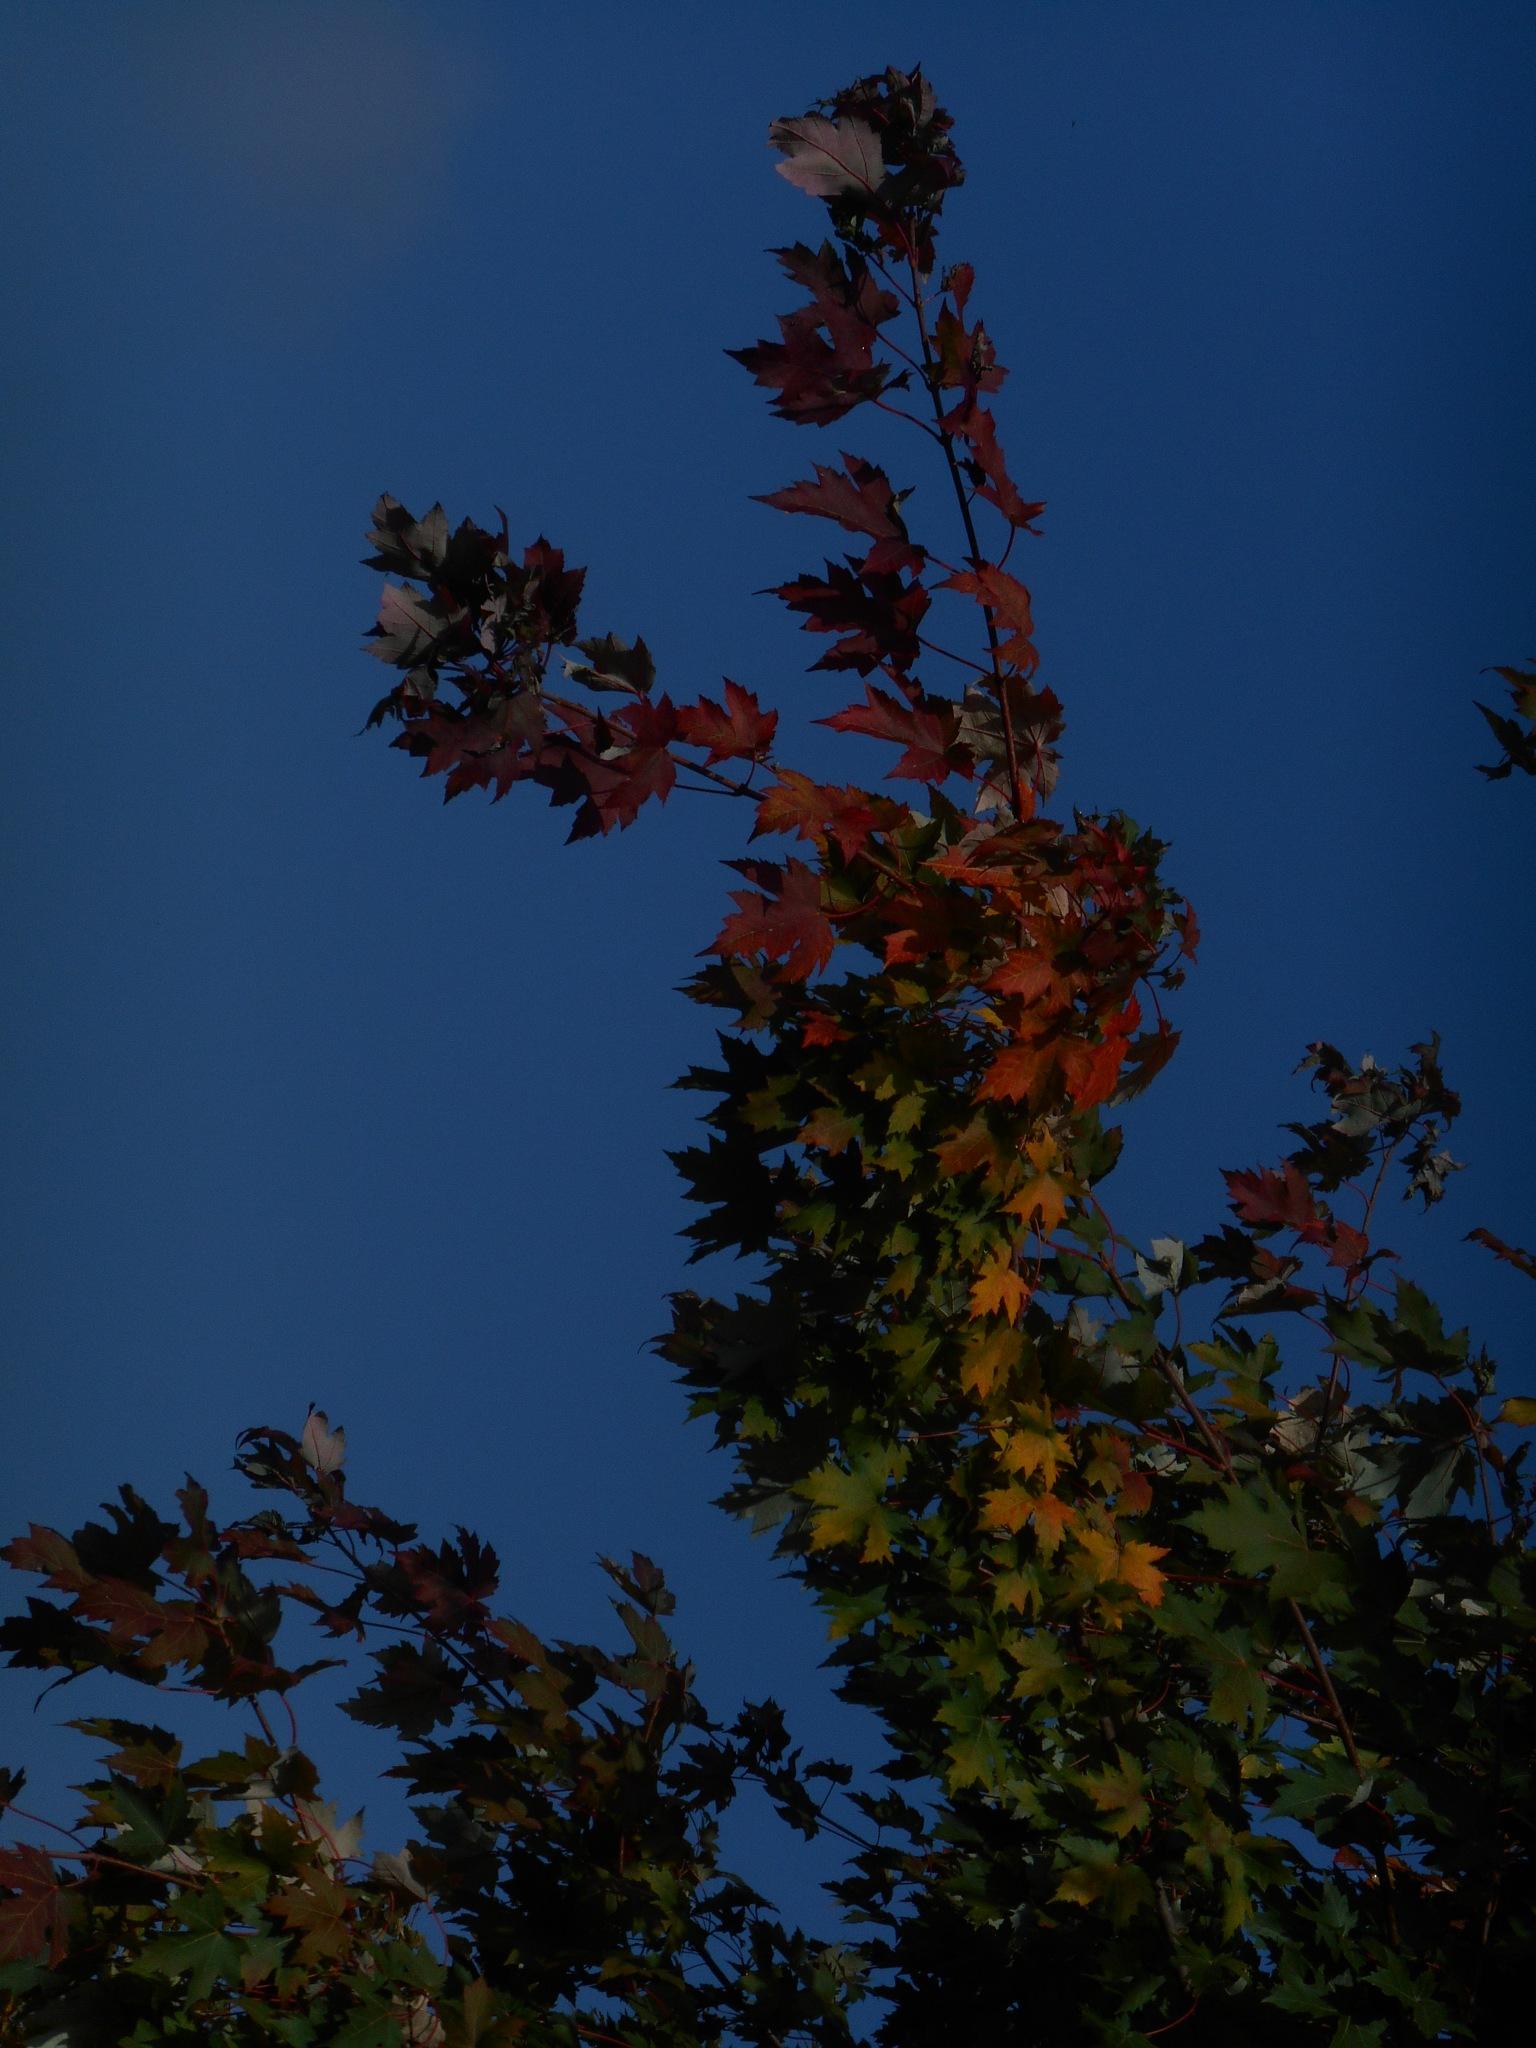 Autumn leaves against a deep blue sky by clairettegardner